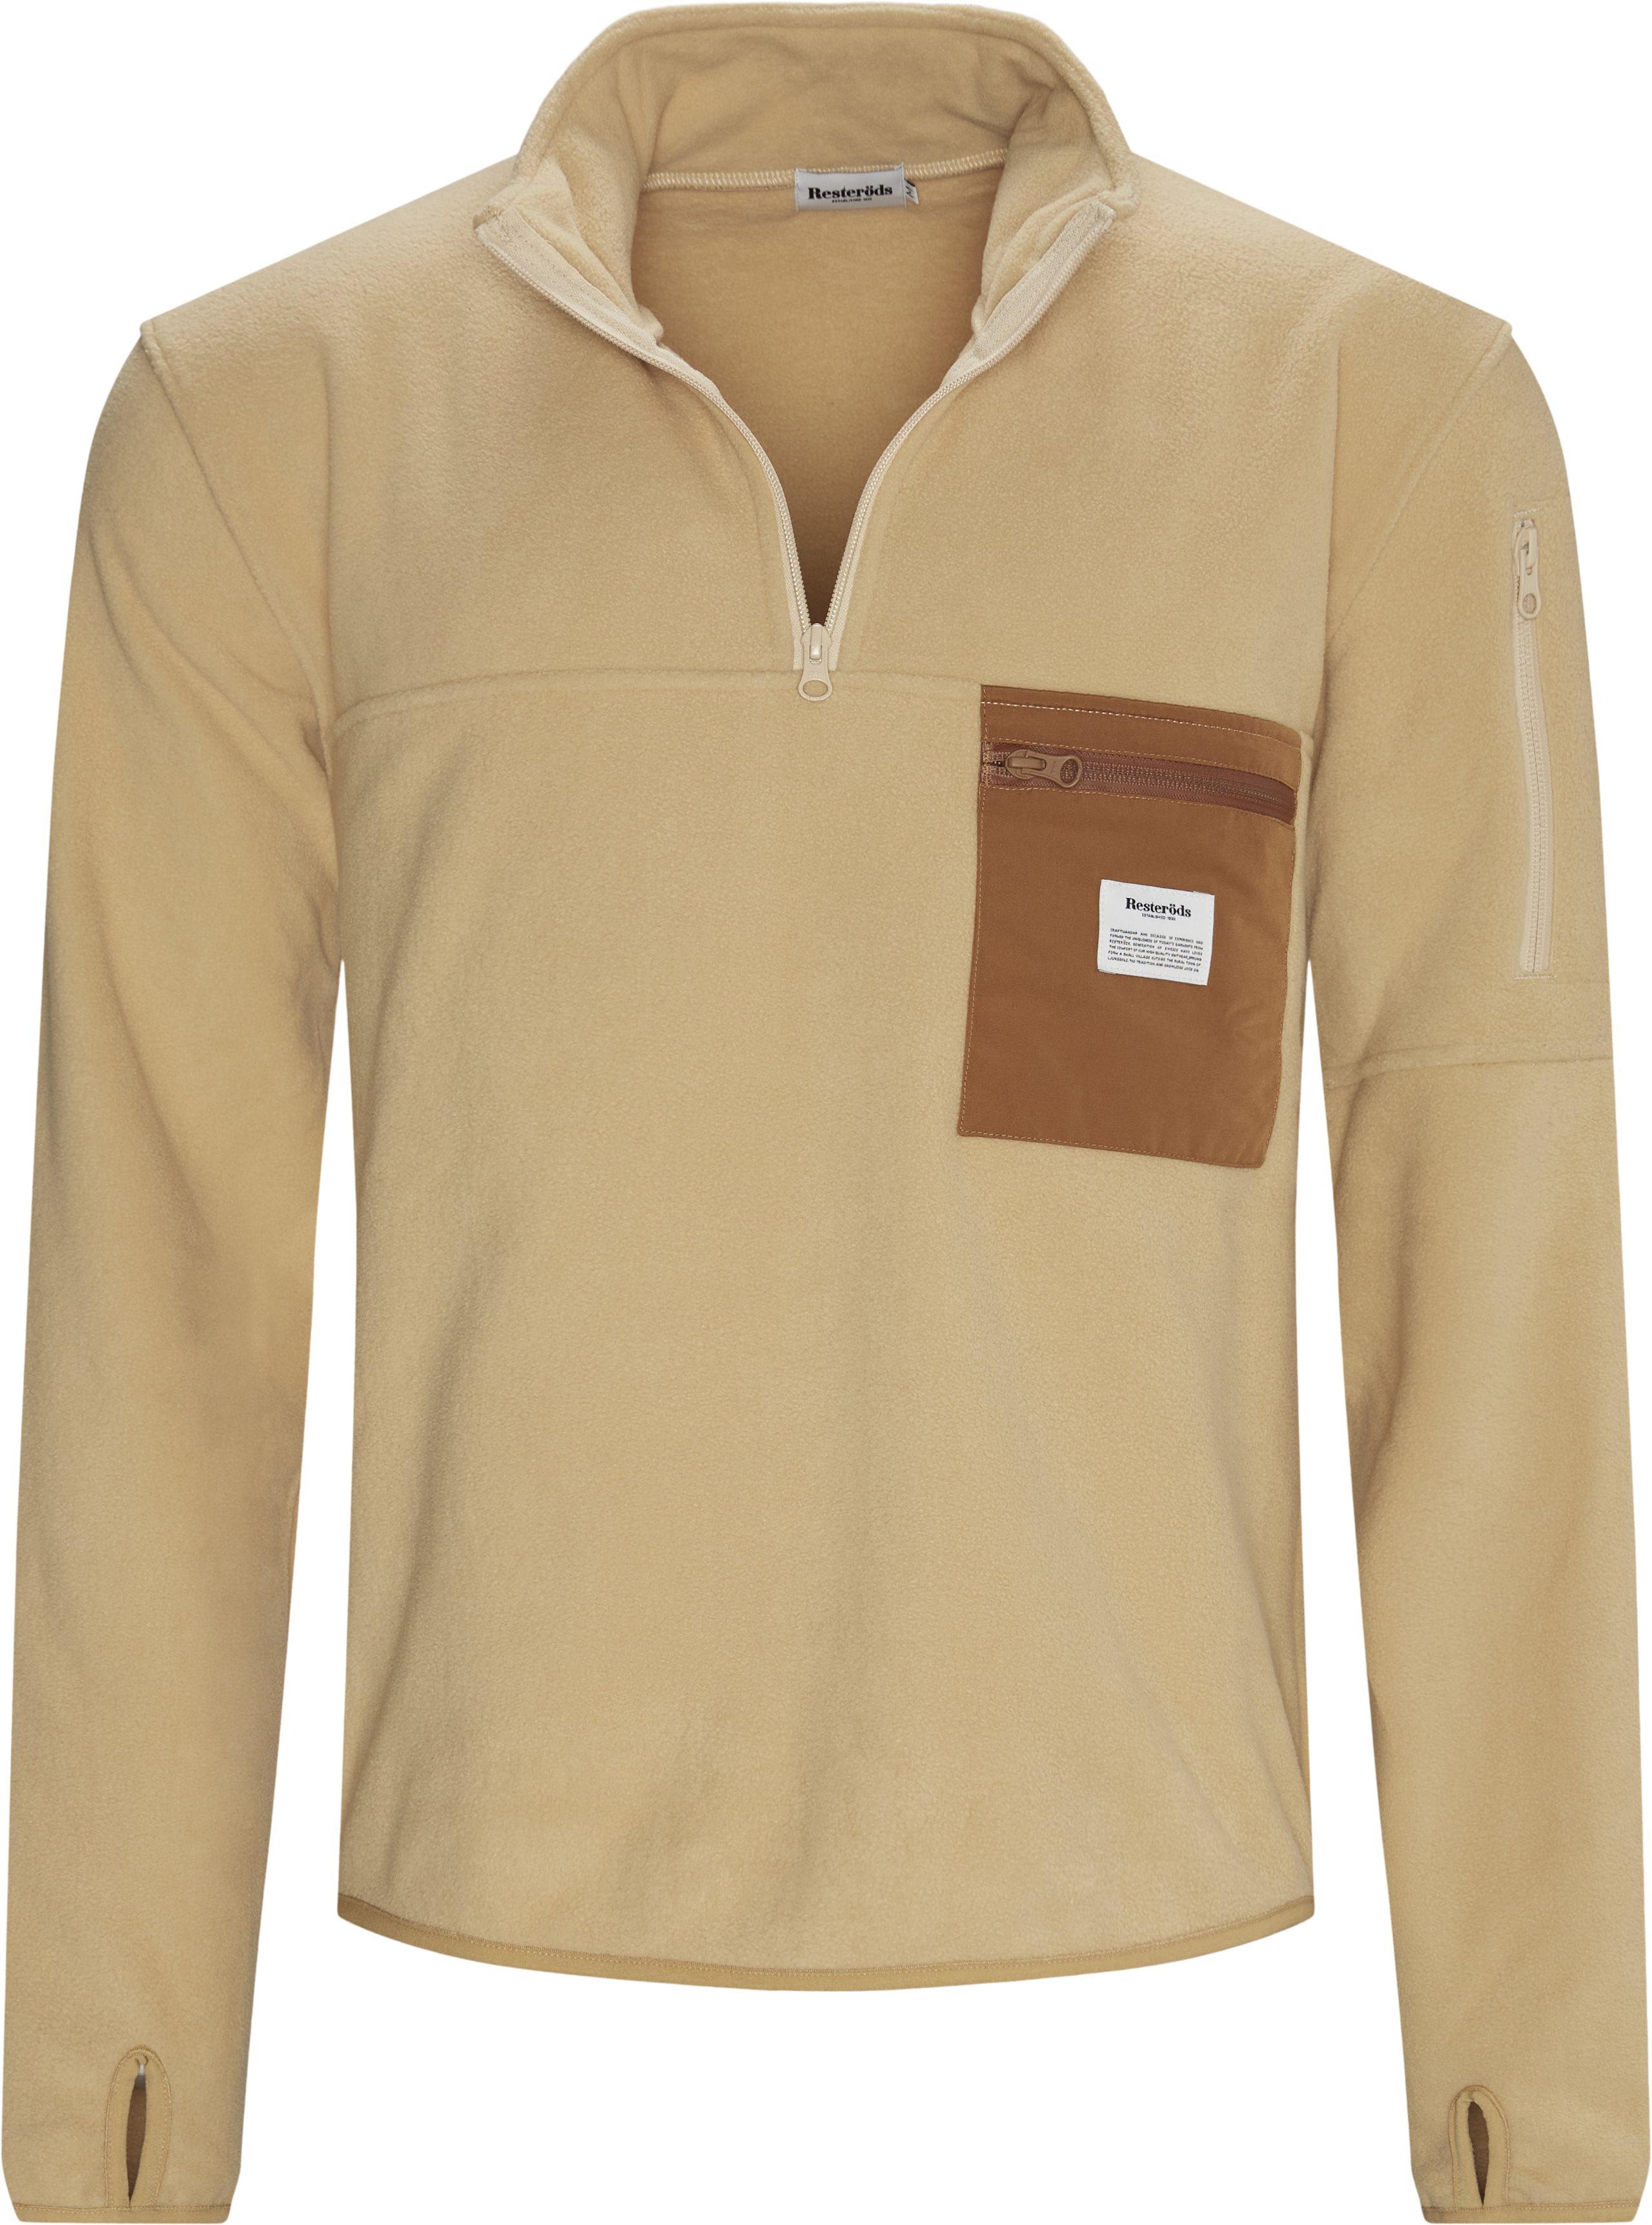 Pullover Fleece Anorak - Jackets - Regular - Sand